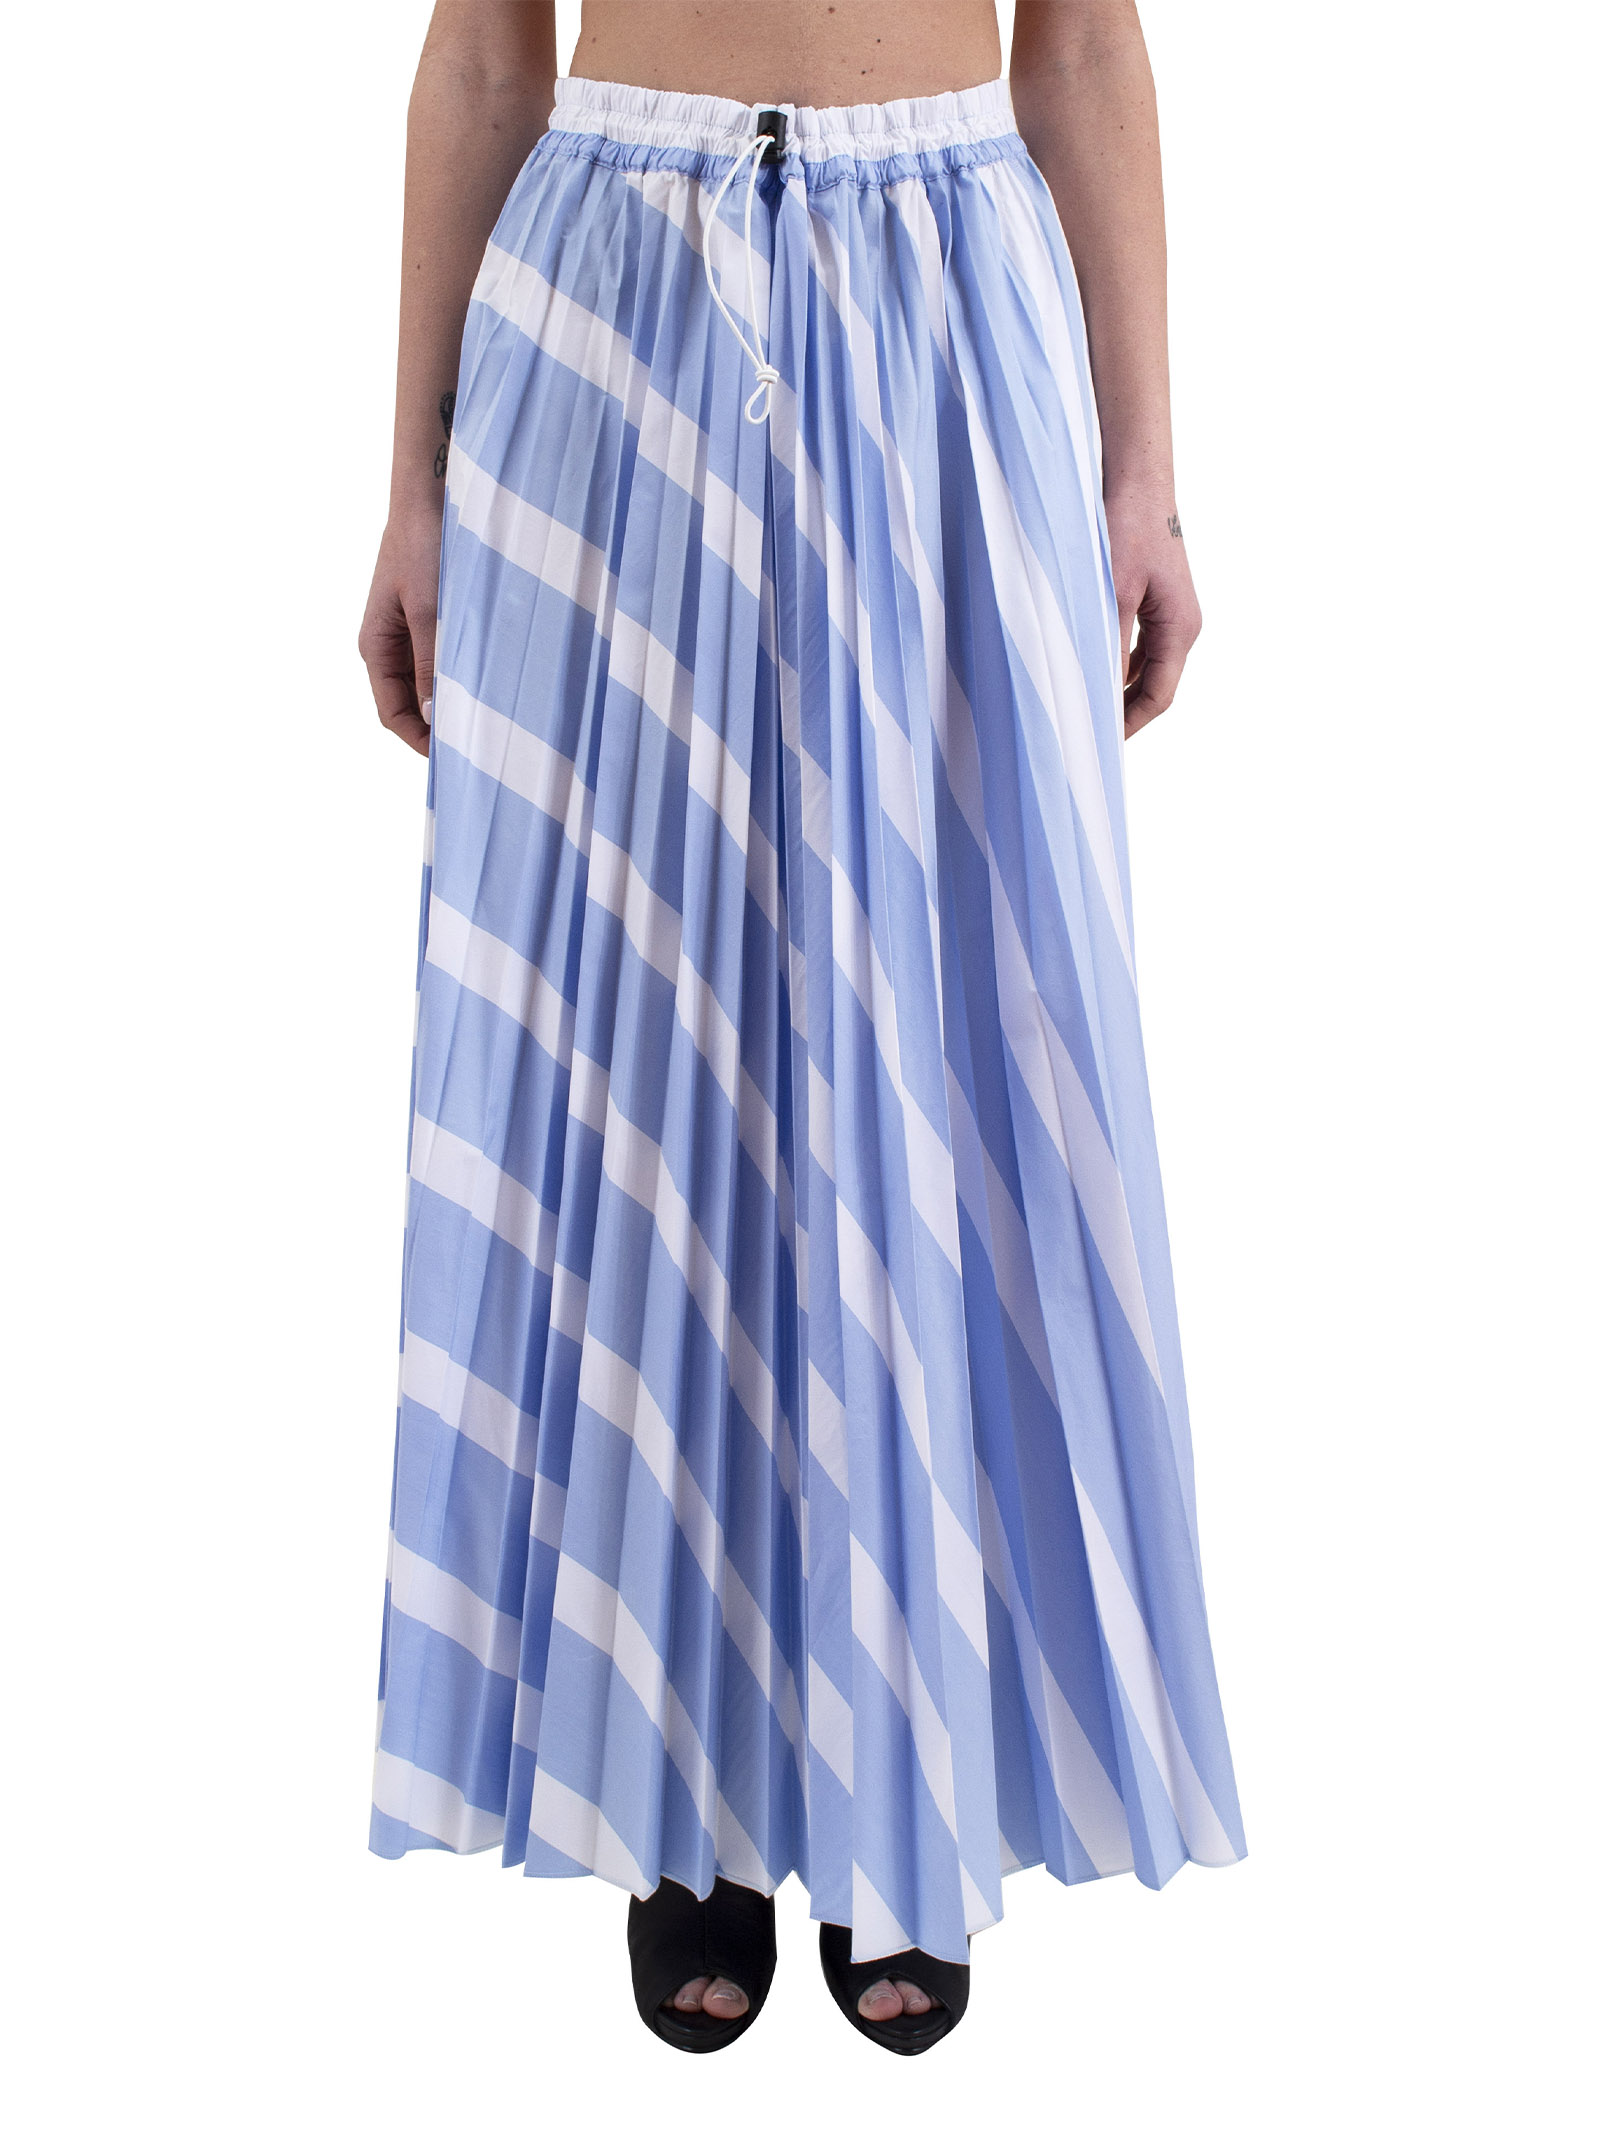 finest selection 93473 18ebd Women's pleated skirt